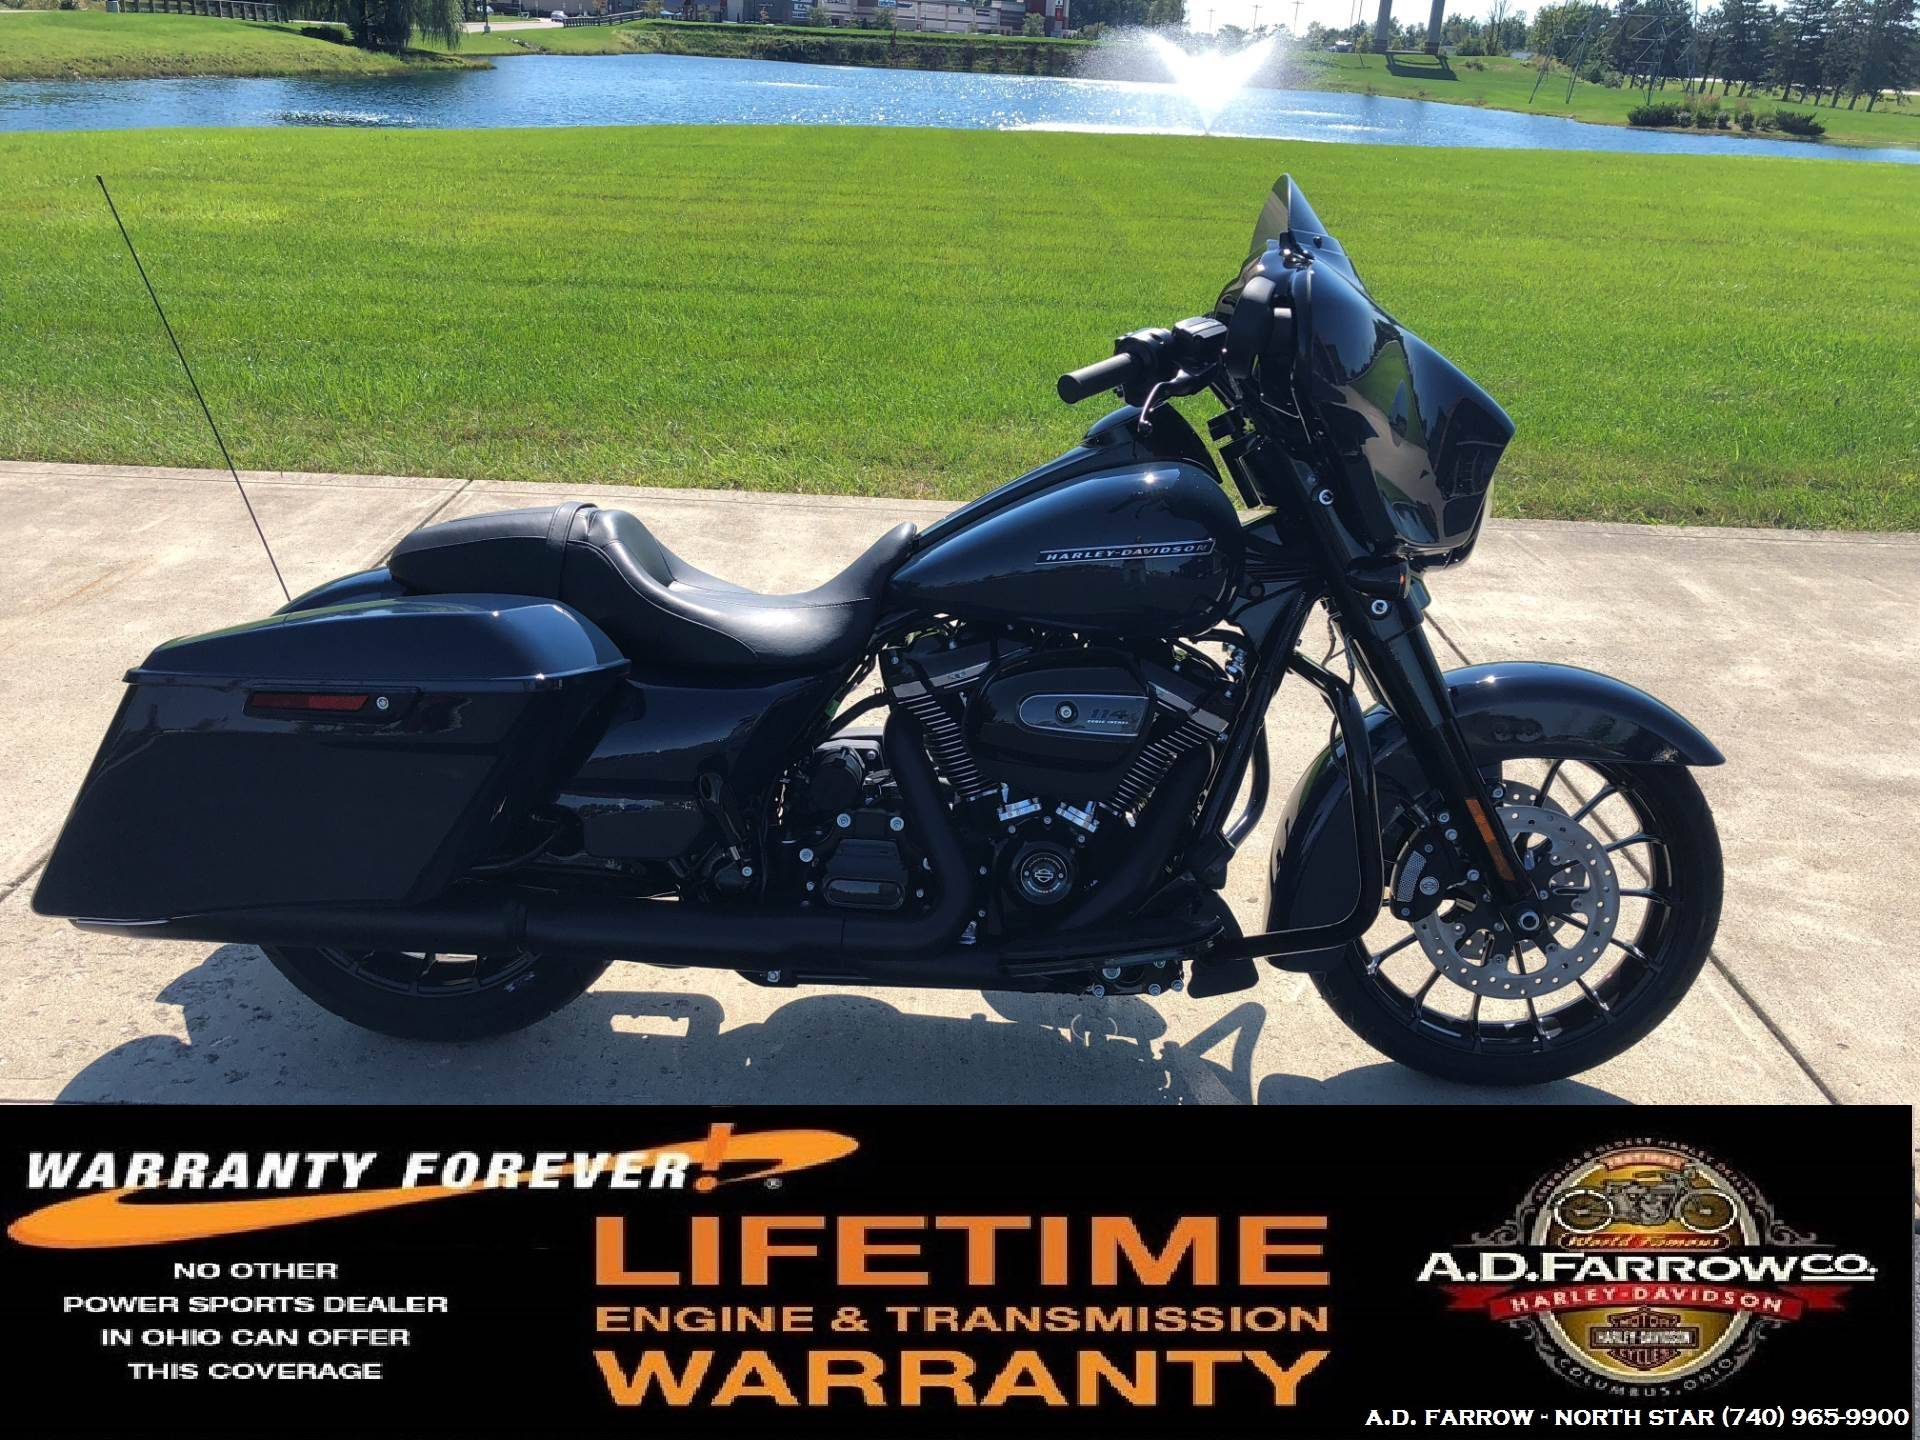 2012 Street Glide Fuse Box Location Just Wiring Diagrams Harley Davidson 2019 Special Motorcycles Sunbury Ohio 2016 Dodge Dart